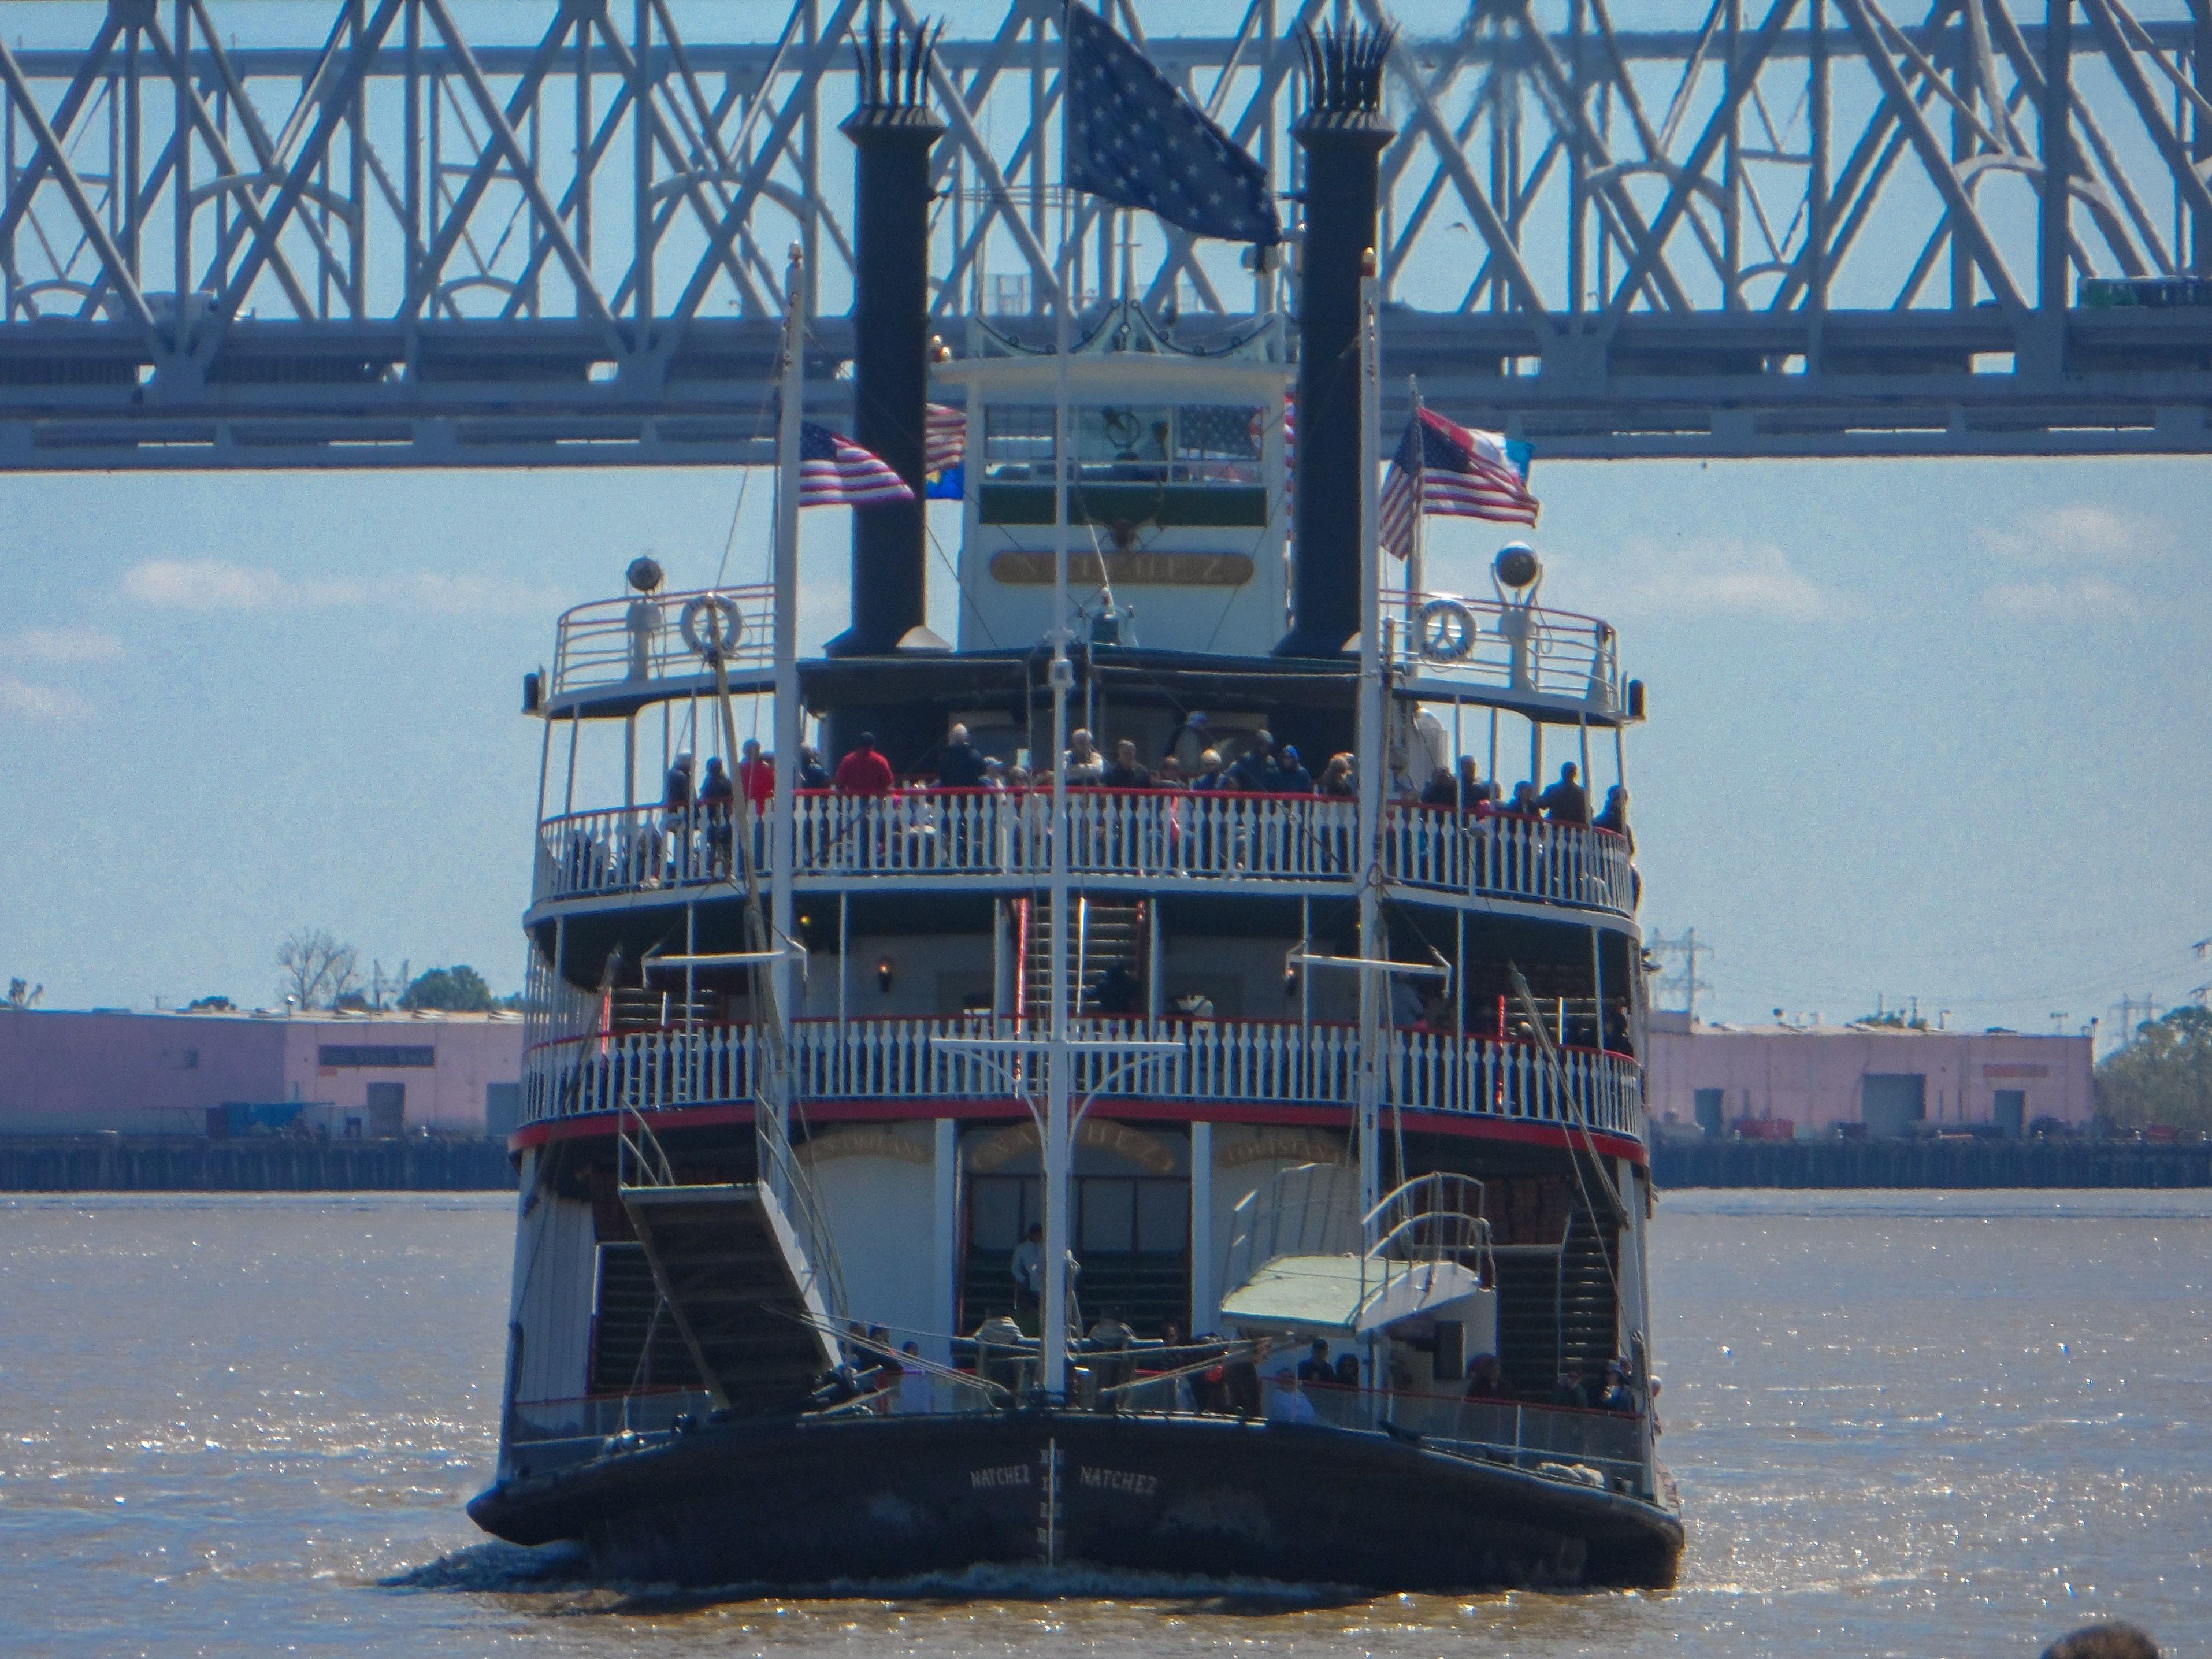 Natchez riverboat neworleans louisiana nola state